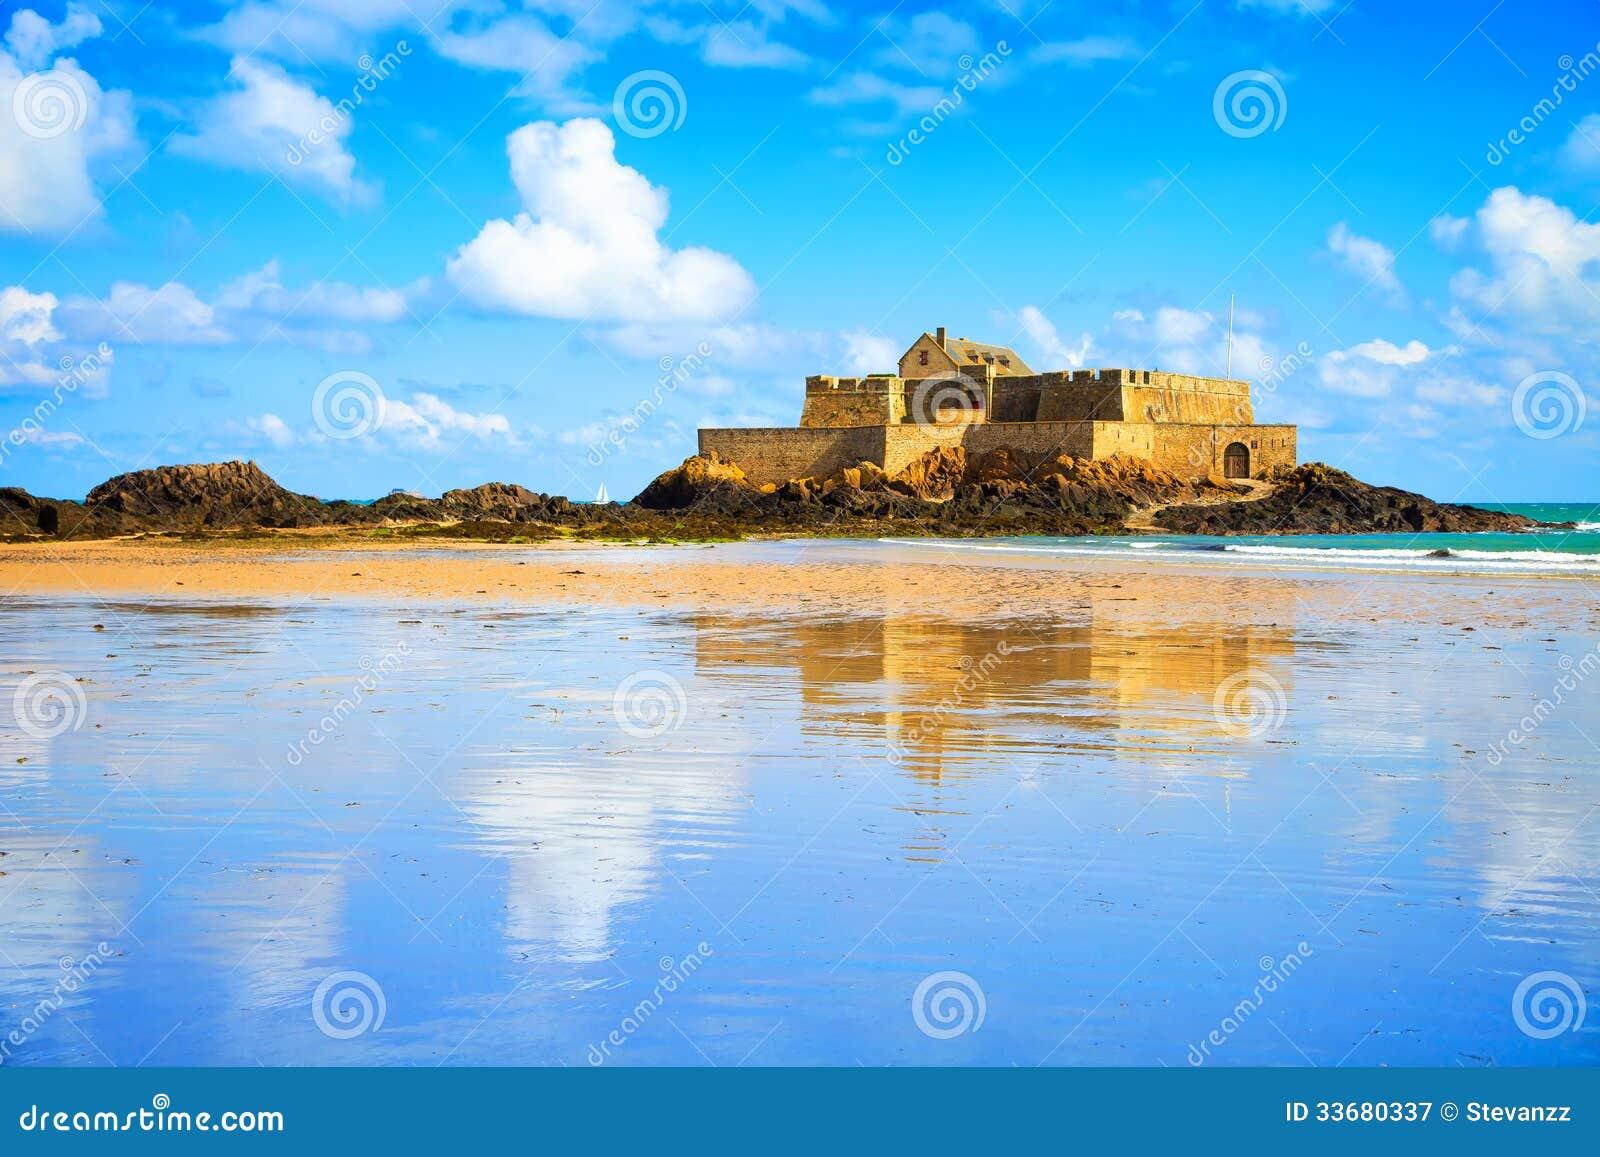 Saint Malo Fort National et plage, marée basse. La Bretagne, France.